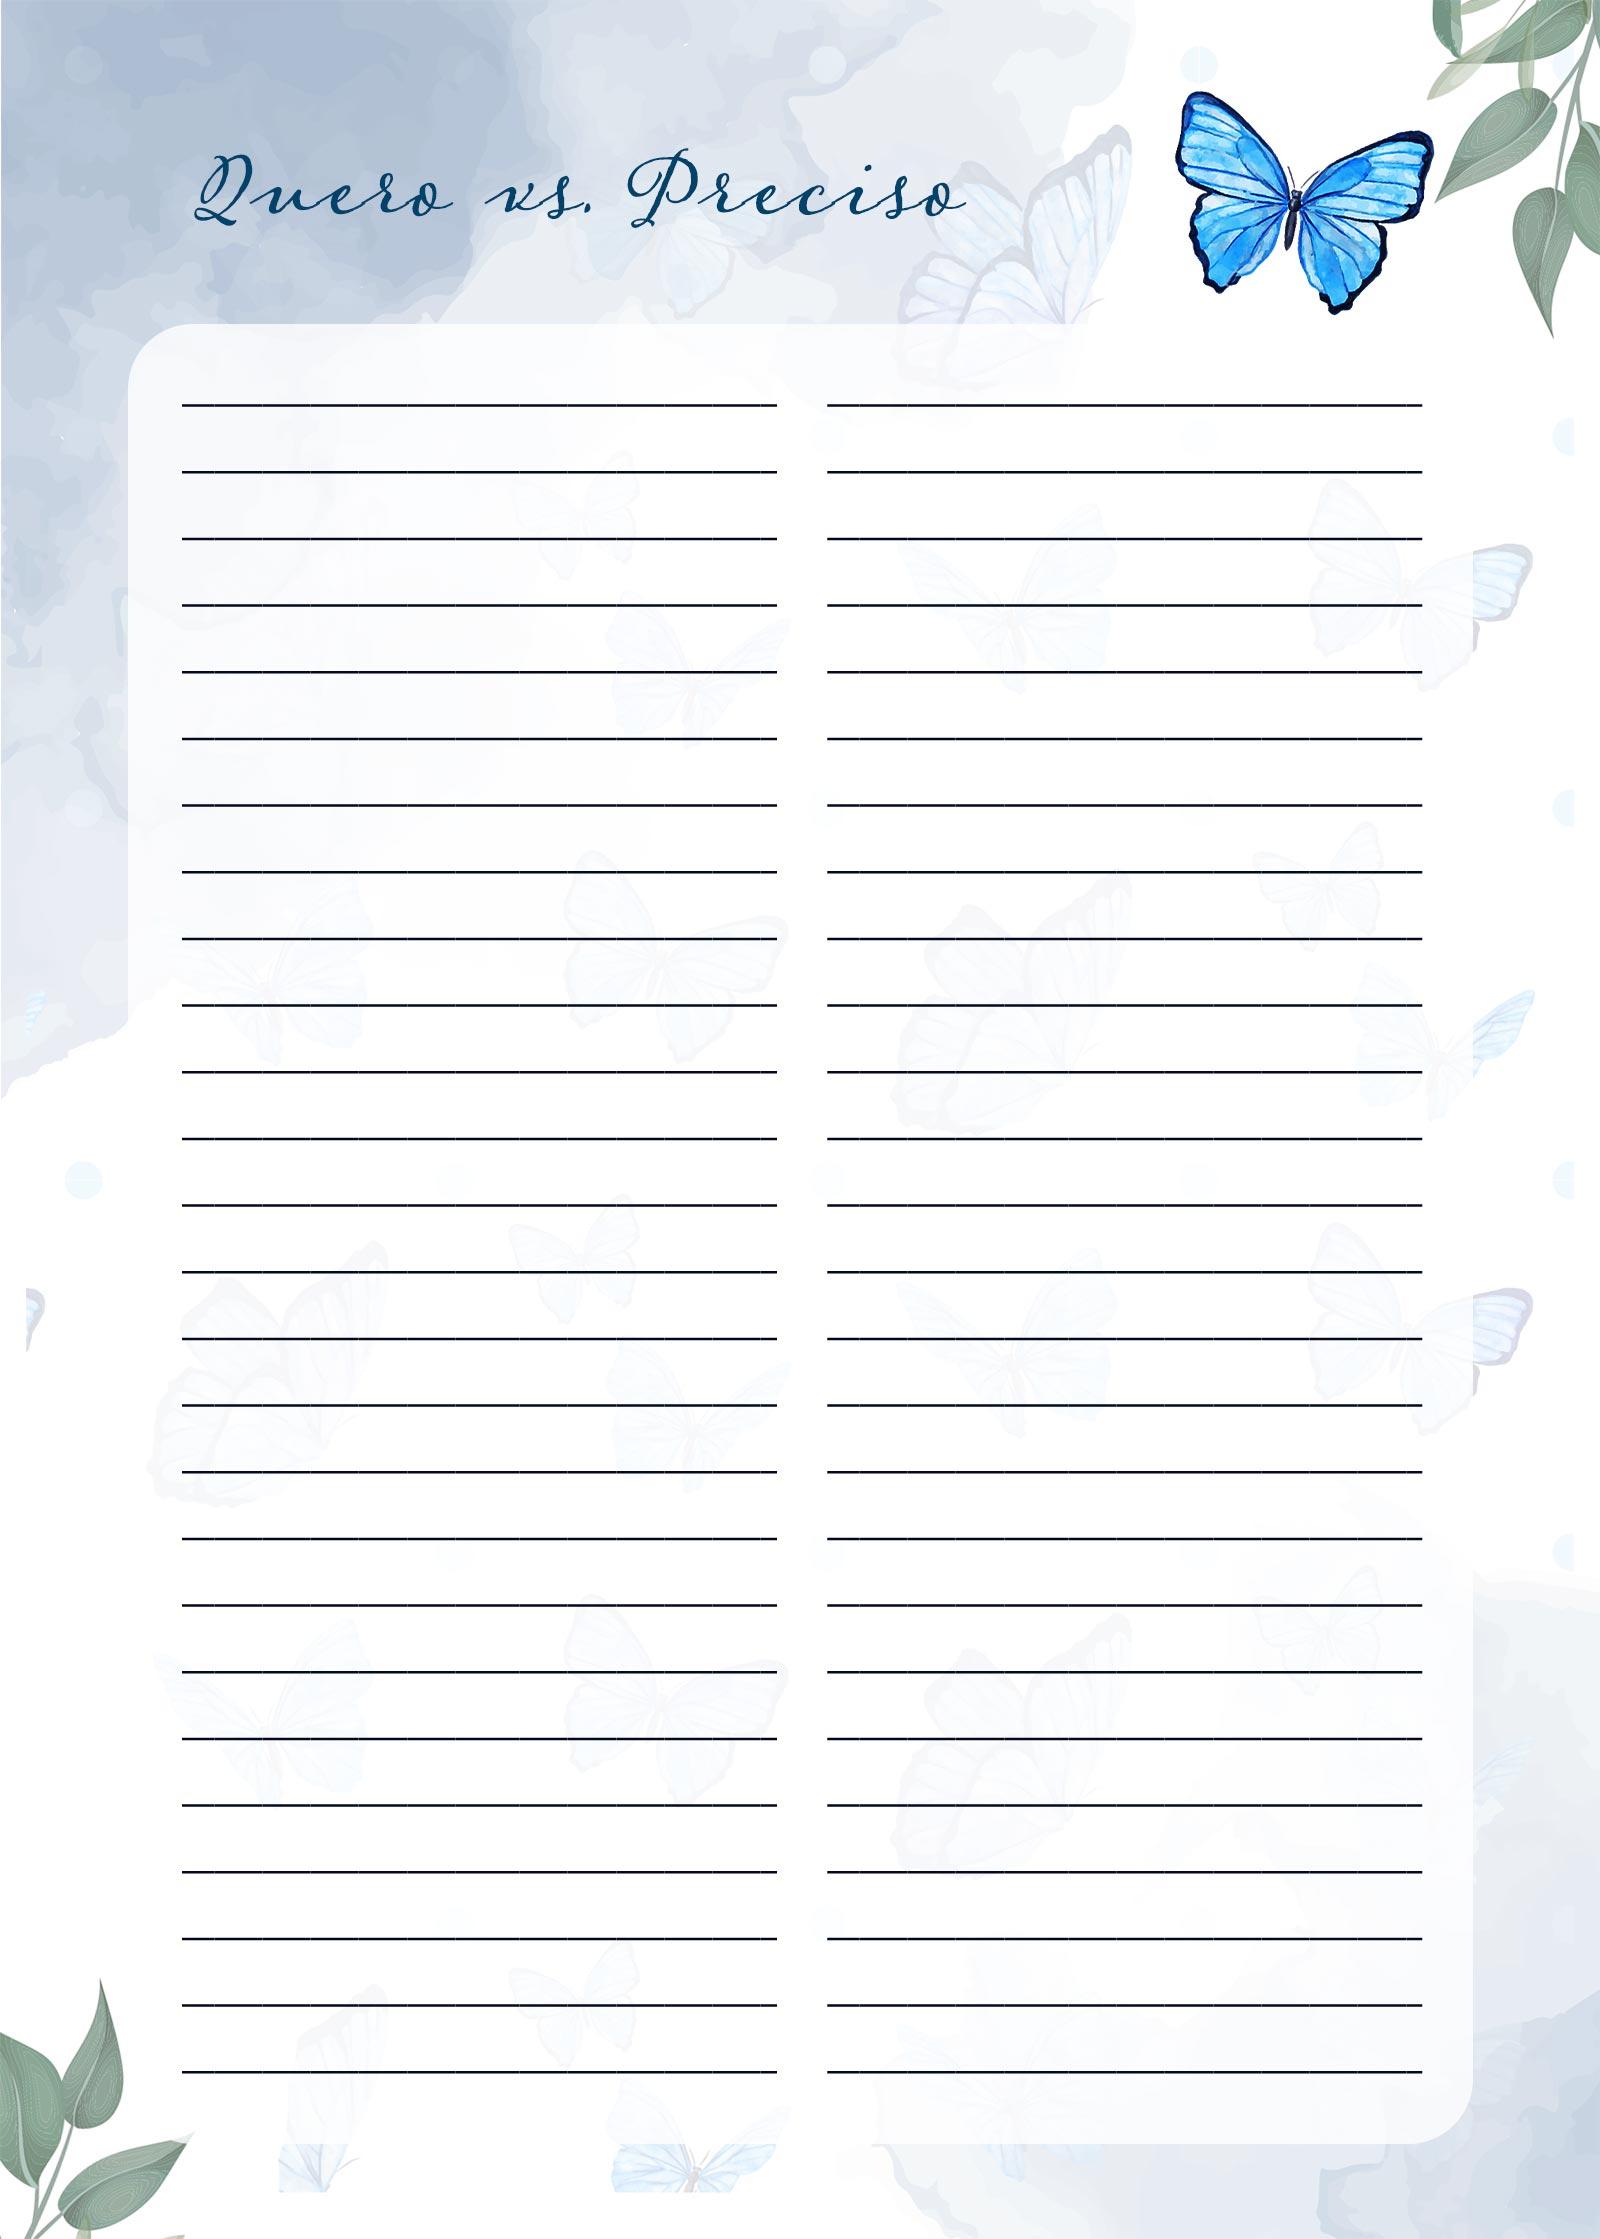 Planner Borboletas Azuis Quero vs Preciso